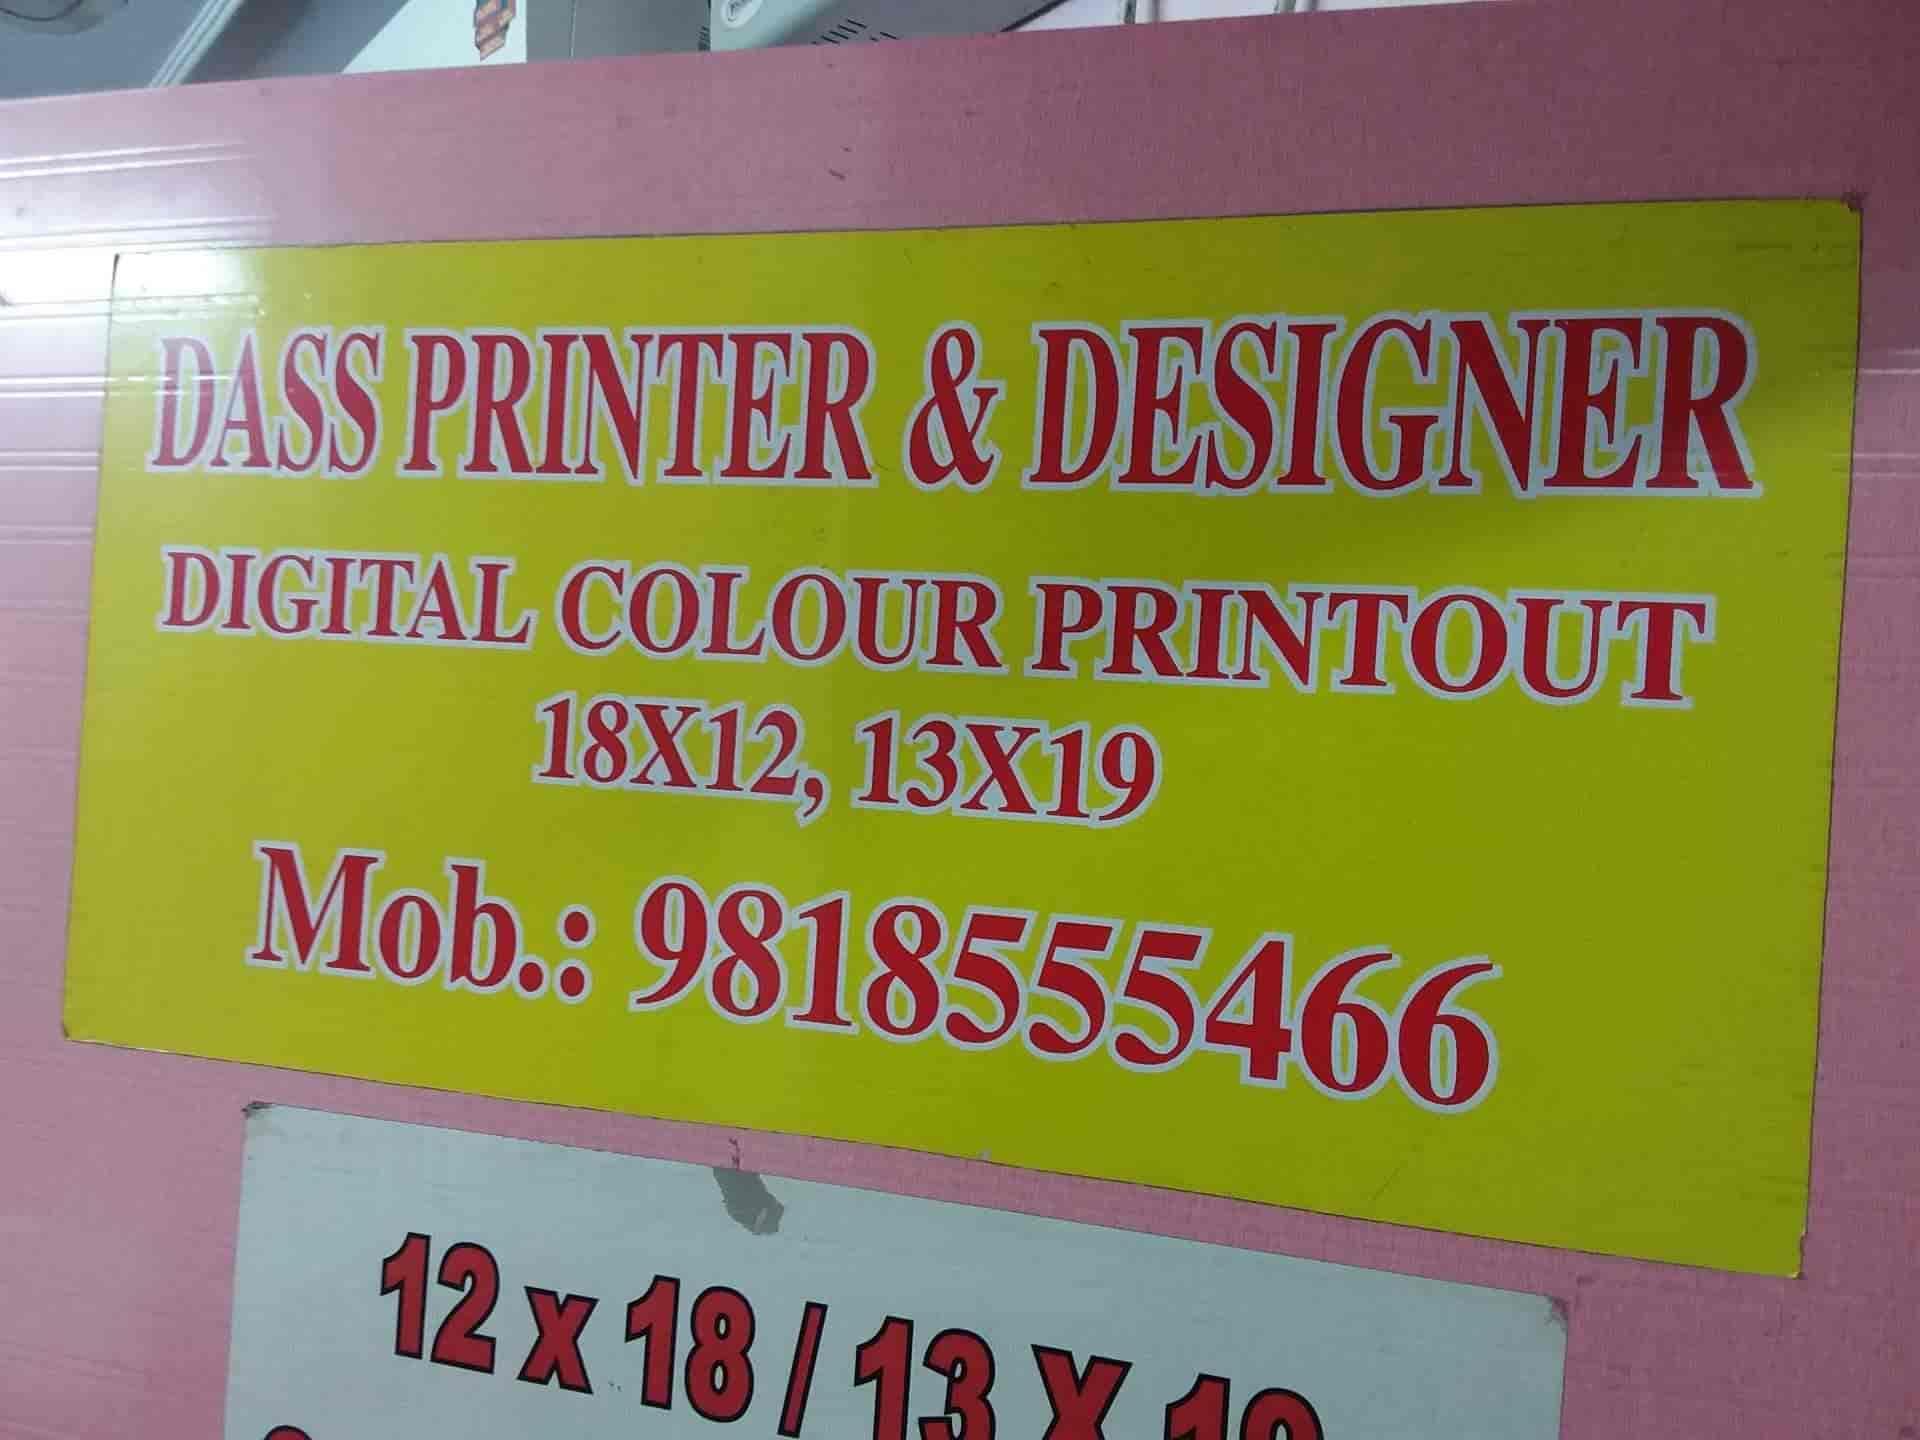 picture about Printout Designer identify D Printer Designer., Shakarpur - World wide web Web